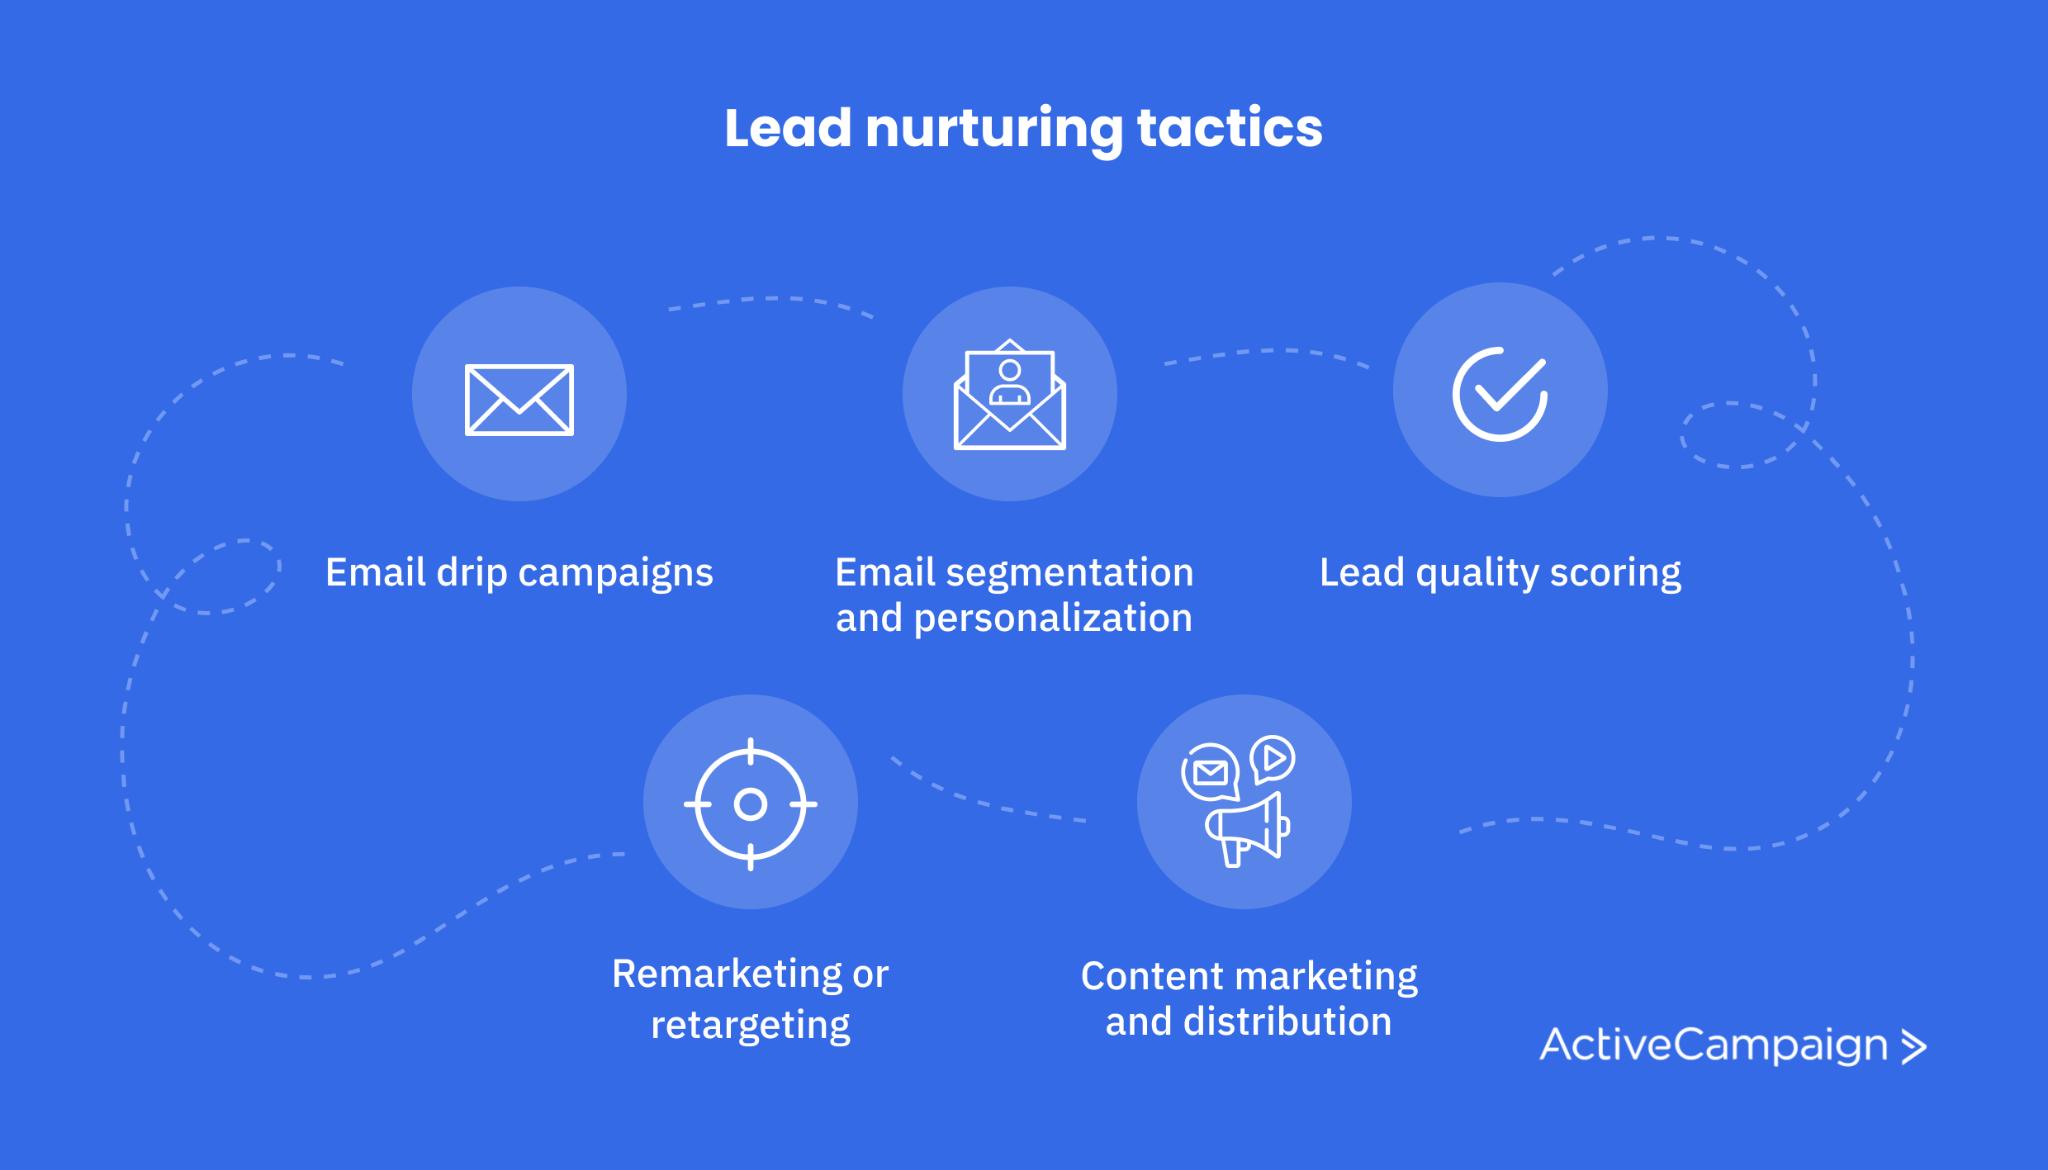 List of lead nurturing tactics including drip campaigns, remarketing, sales calls, etc